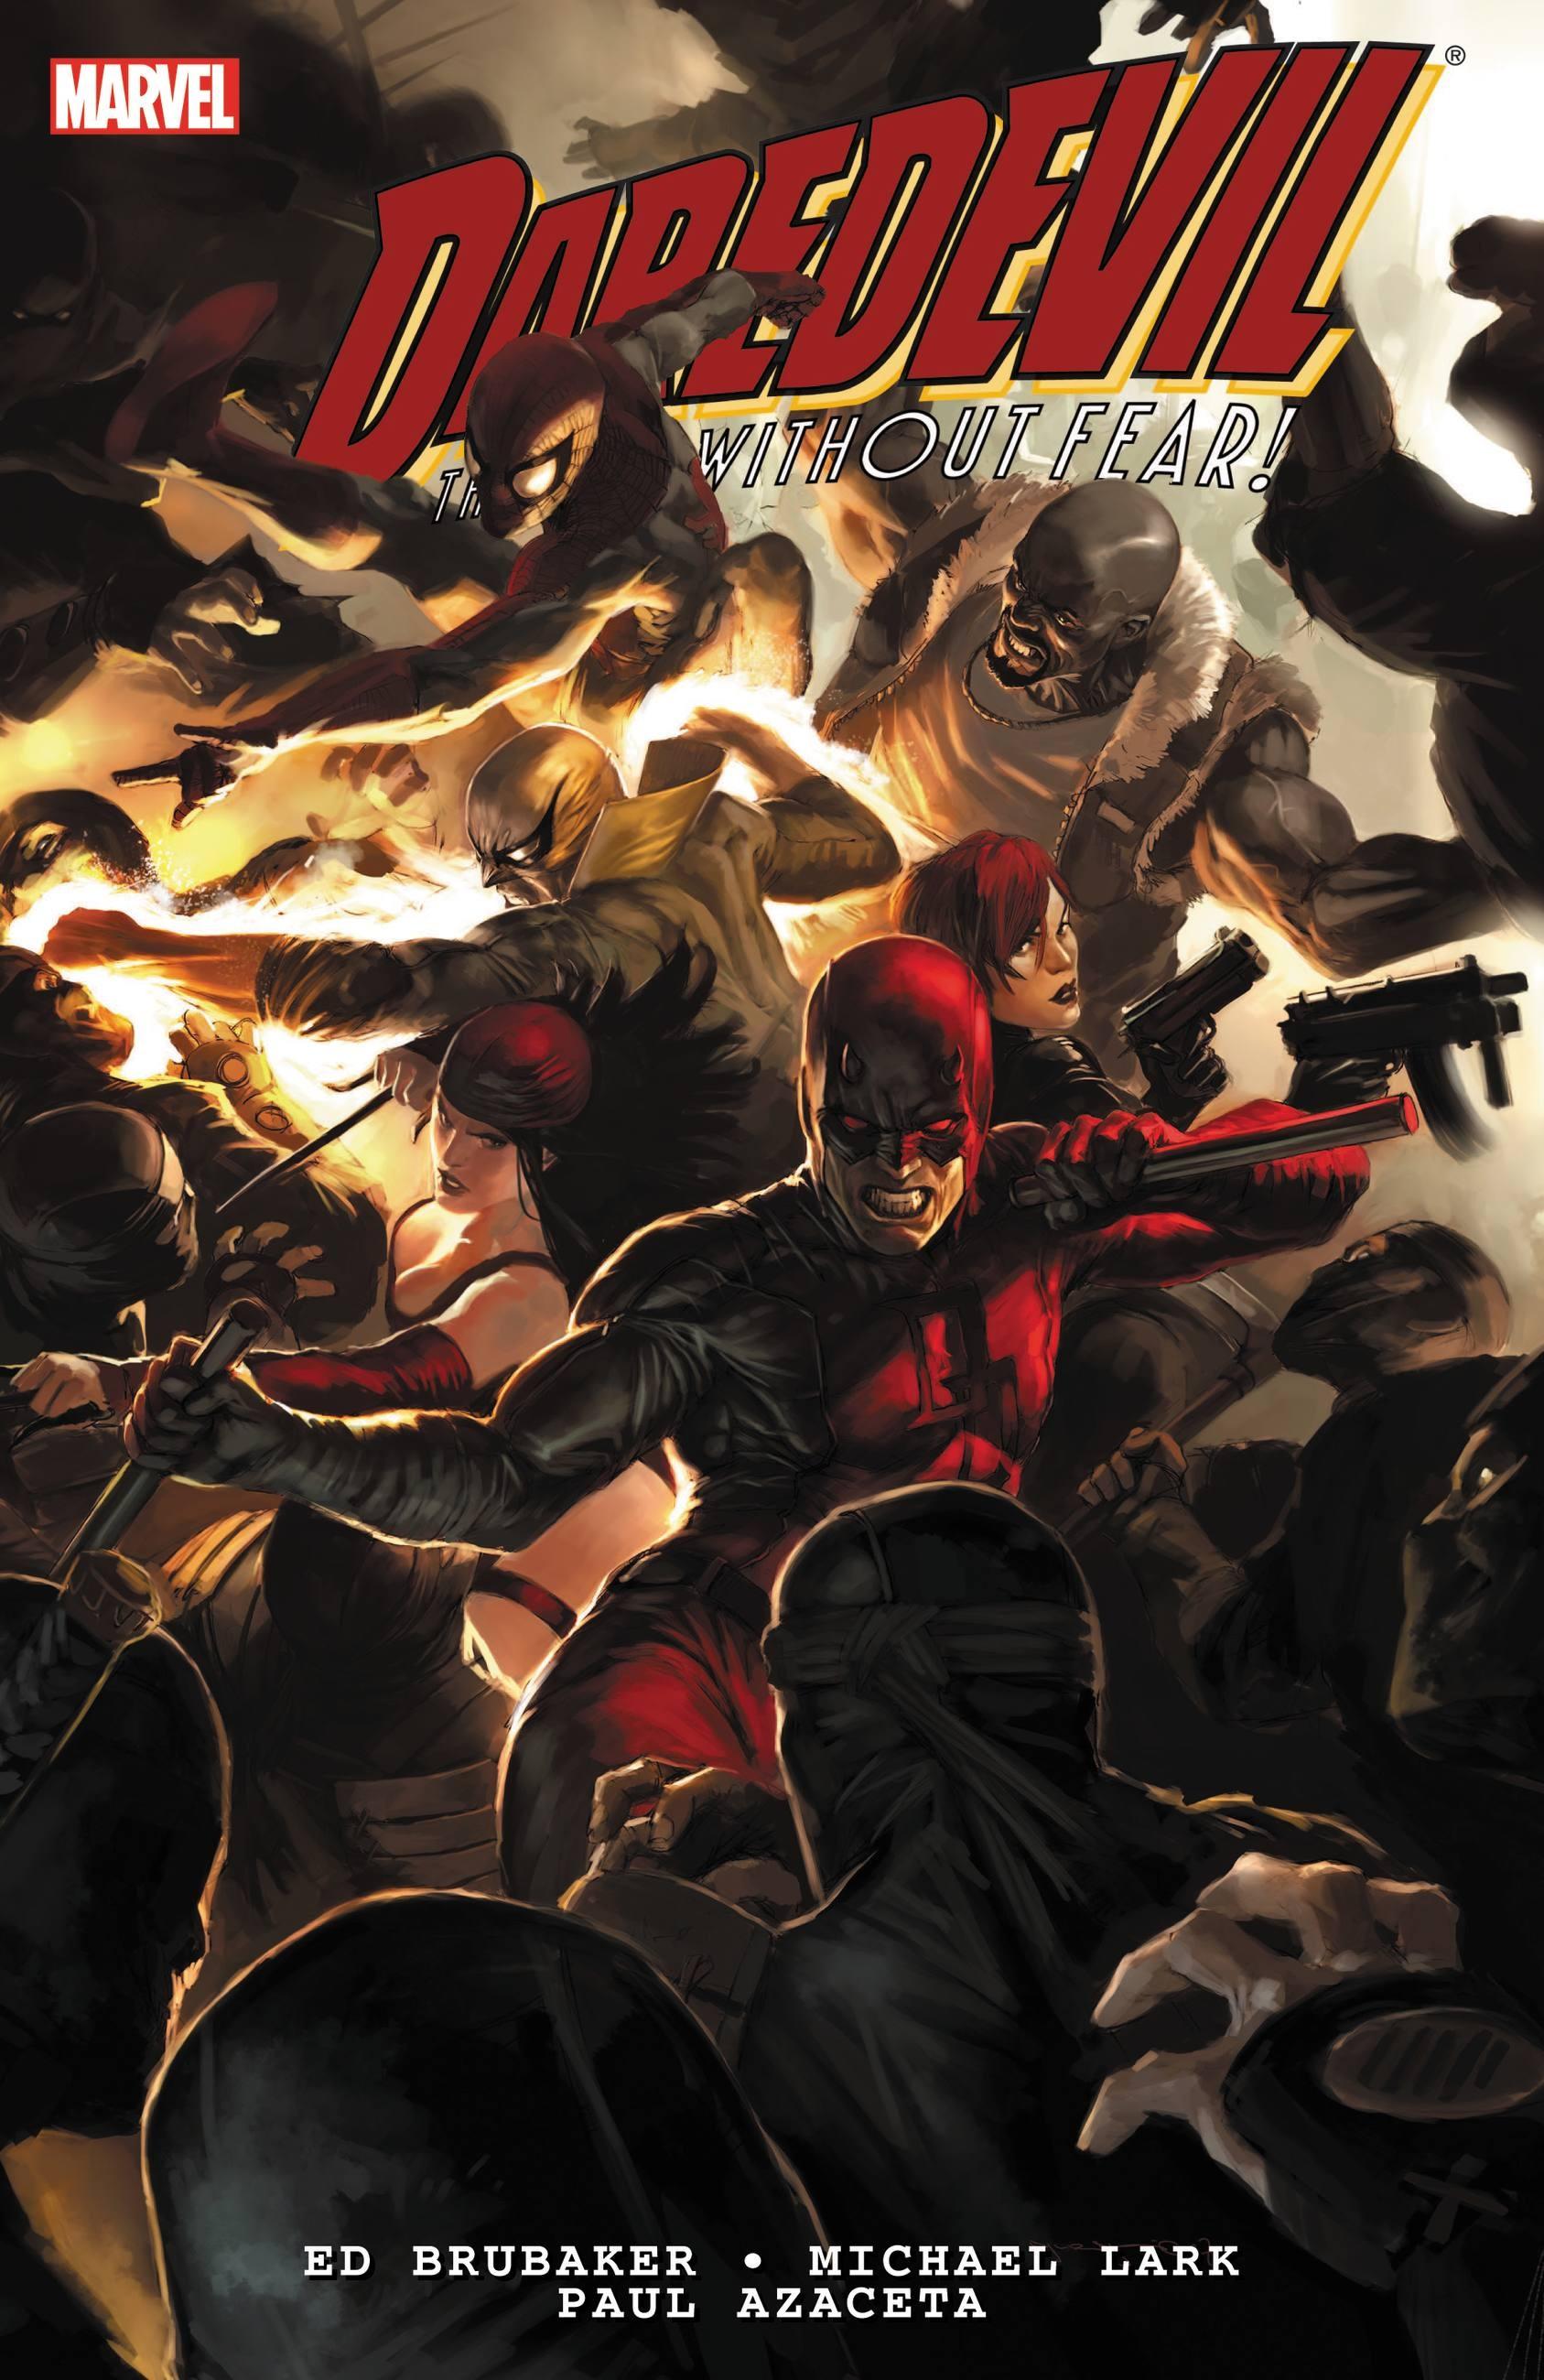 Daredevil by Ed Brubaker & Michael Lark Ultimate Collection - Book 2 ultimate sticker book dangerous dinosaurs